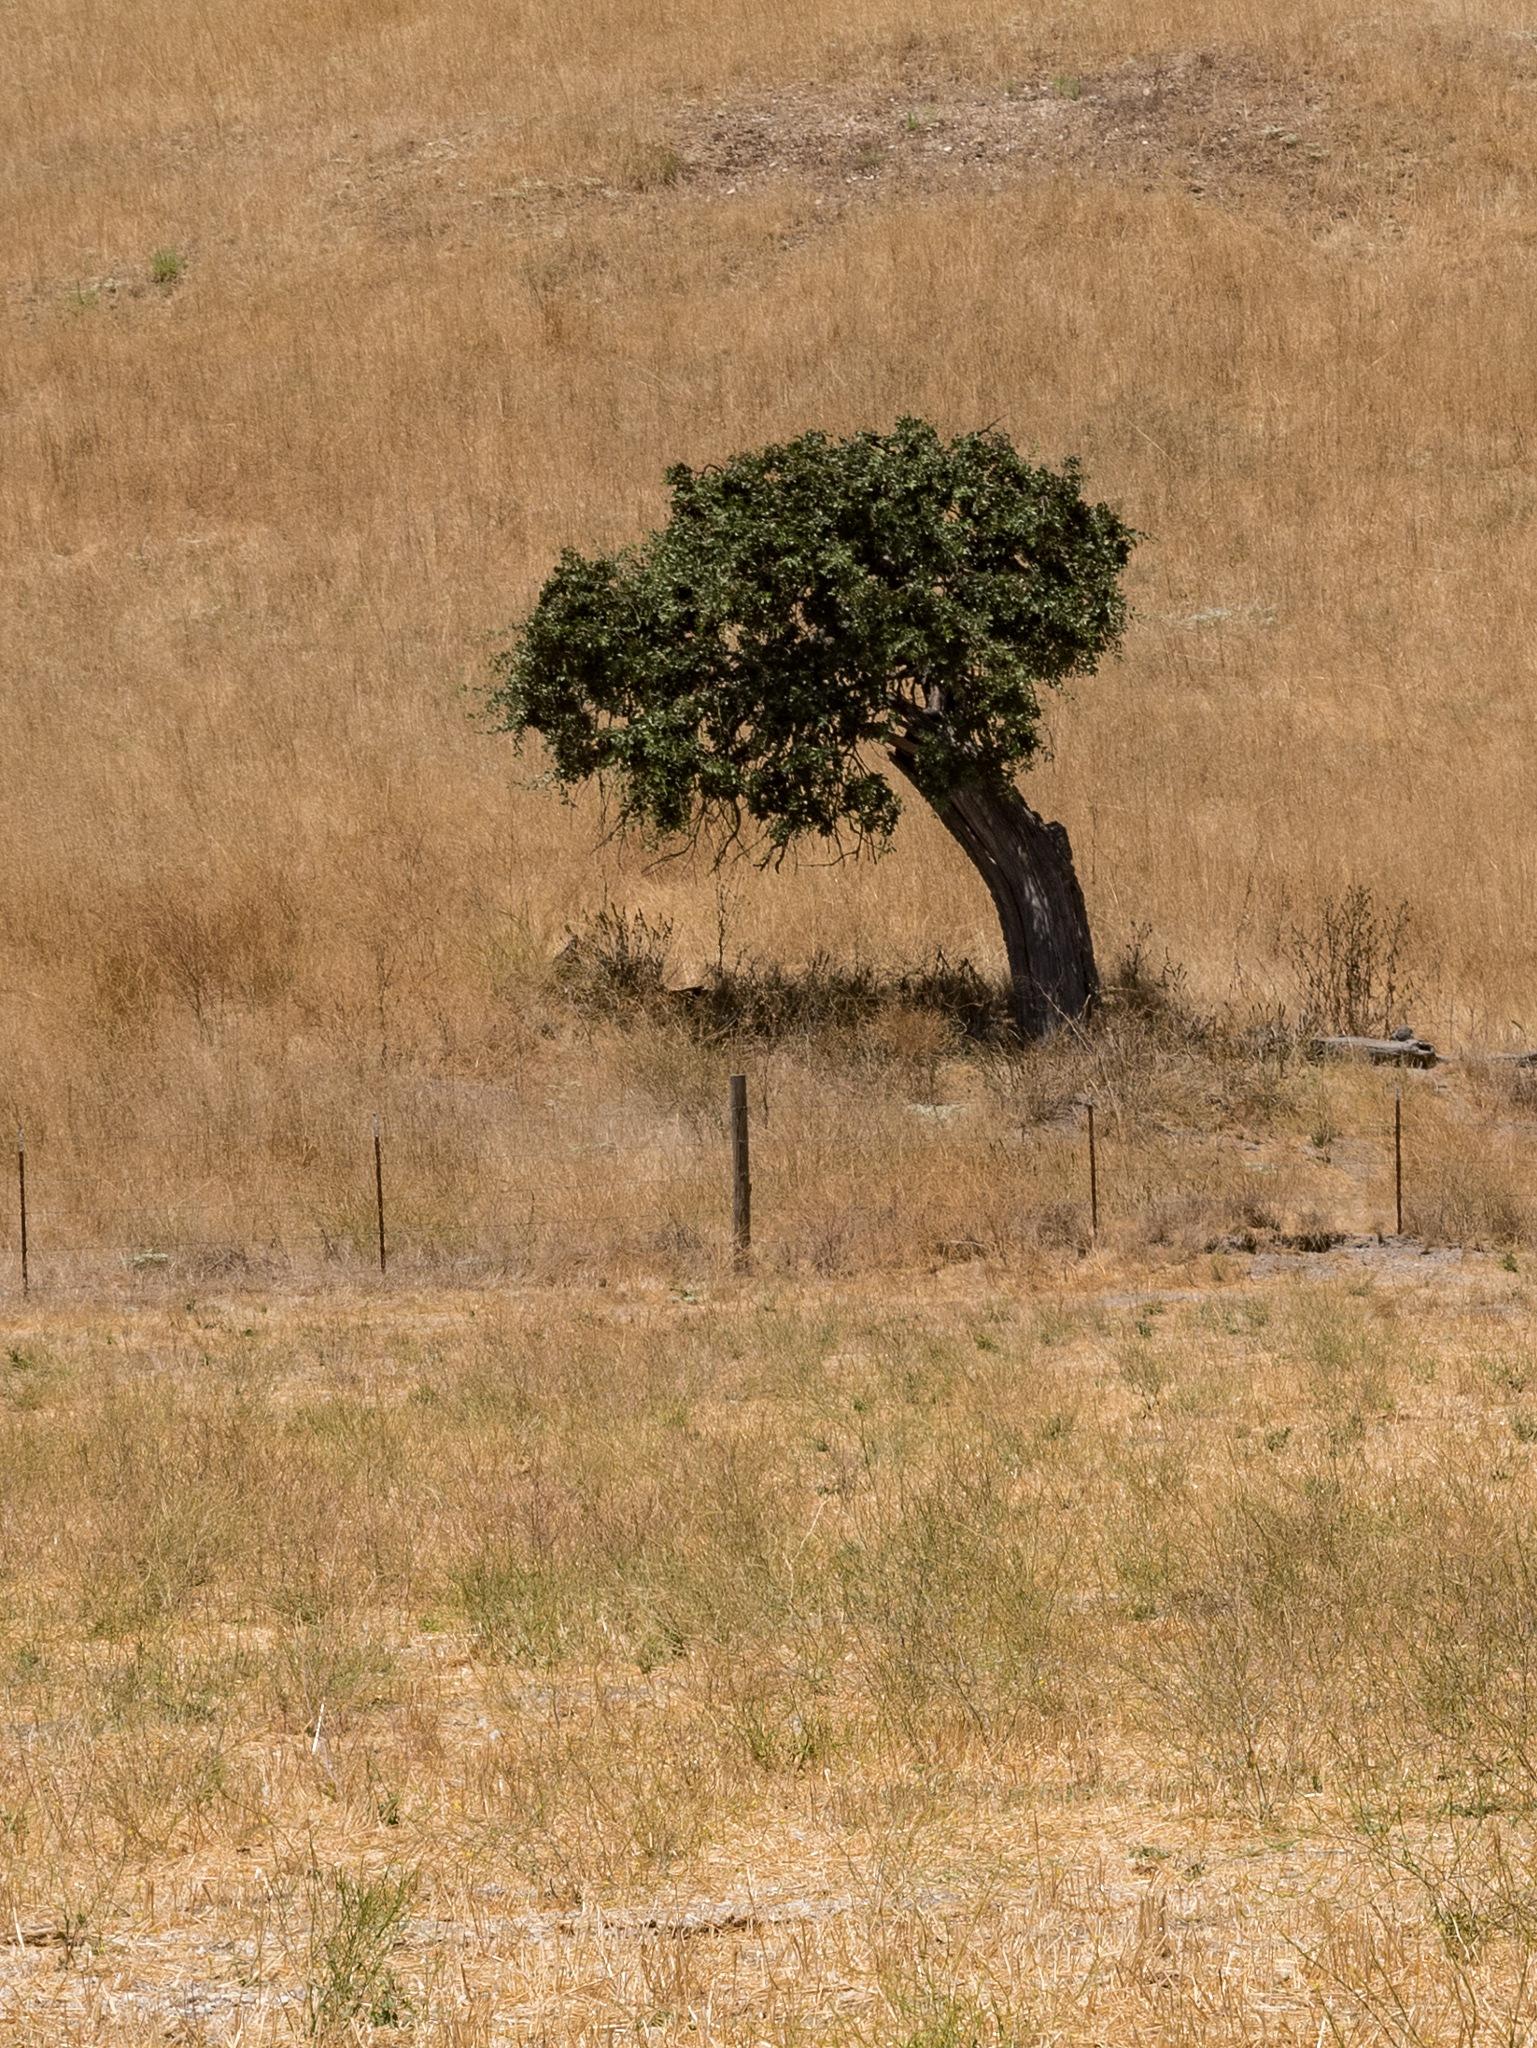 TREE by DrJohnHodgson